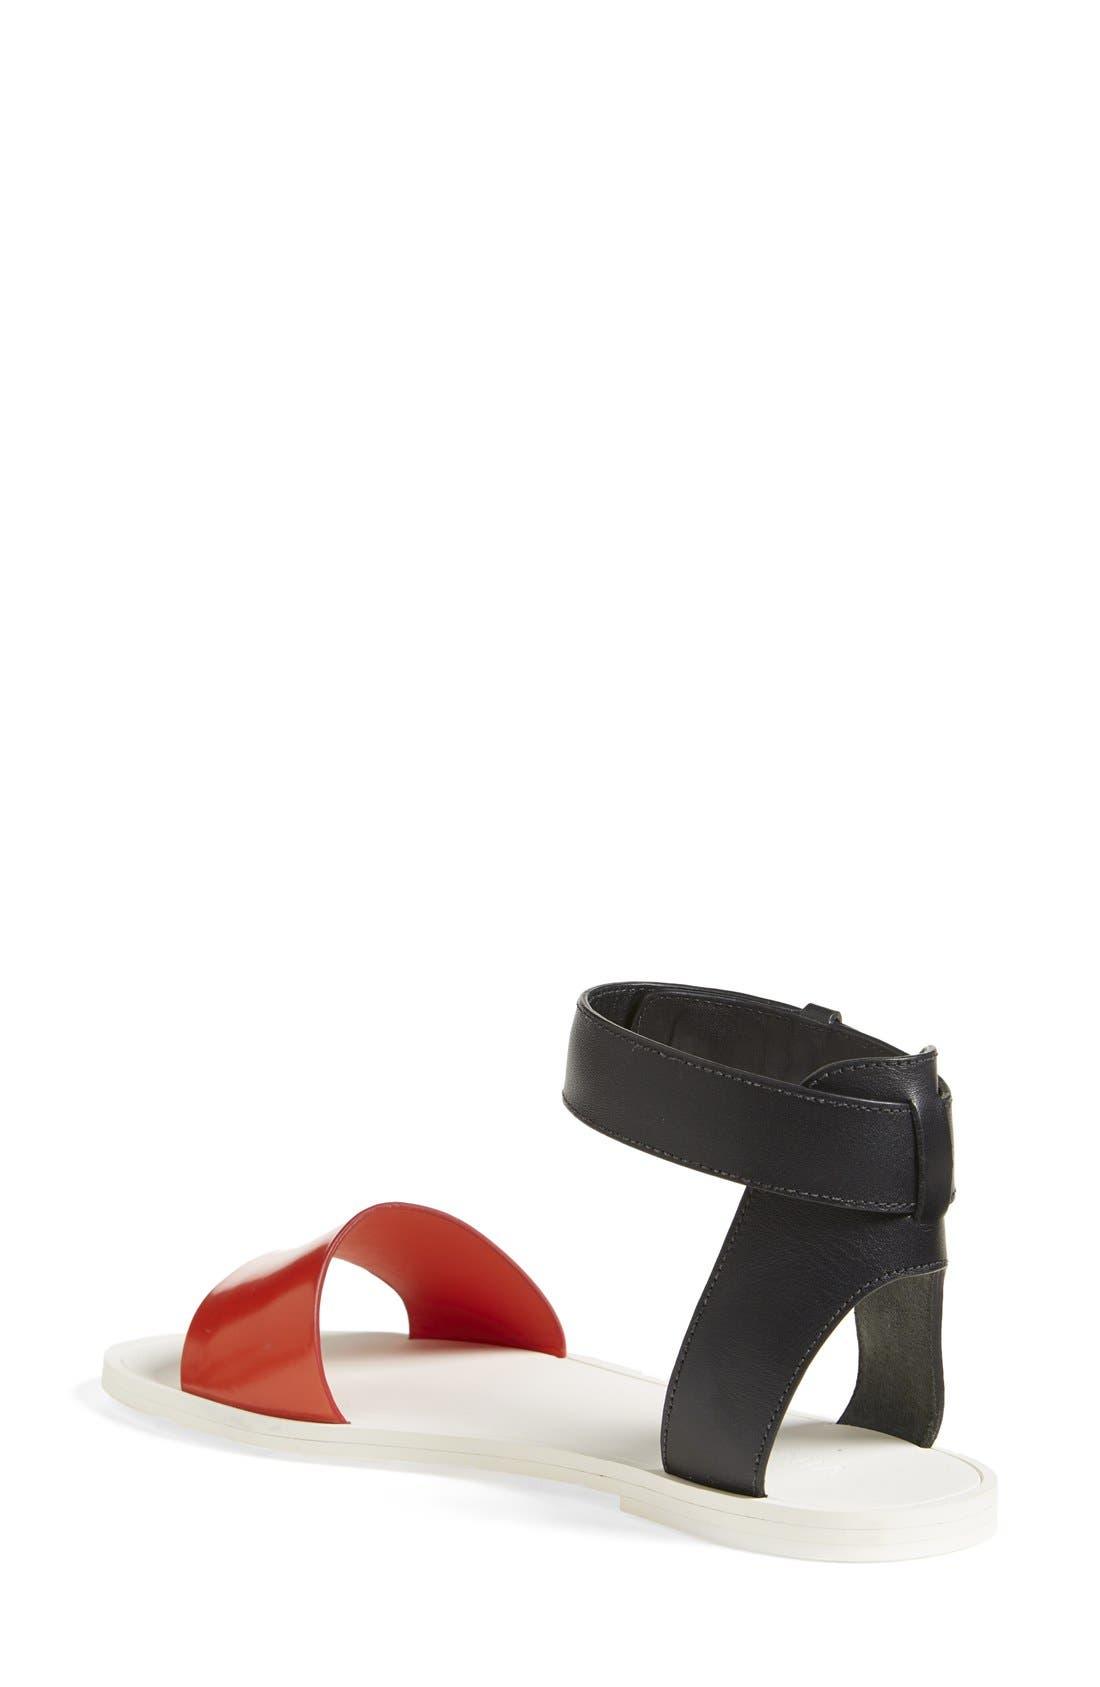 Alternate Image 2  - Vince 'Sawyer' Colorblock Sandal (Women)